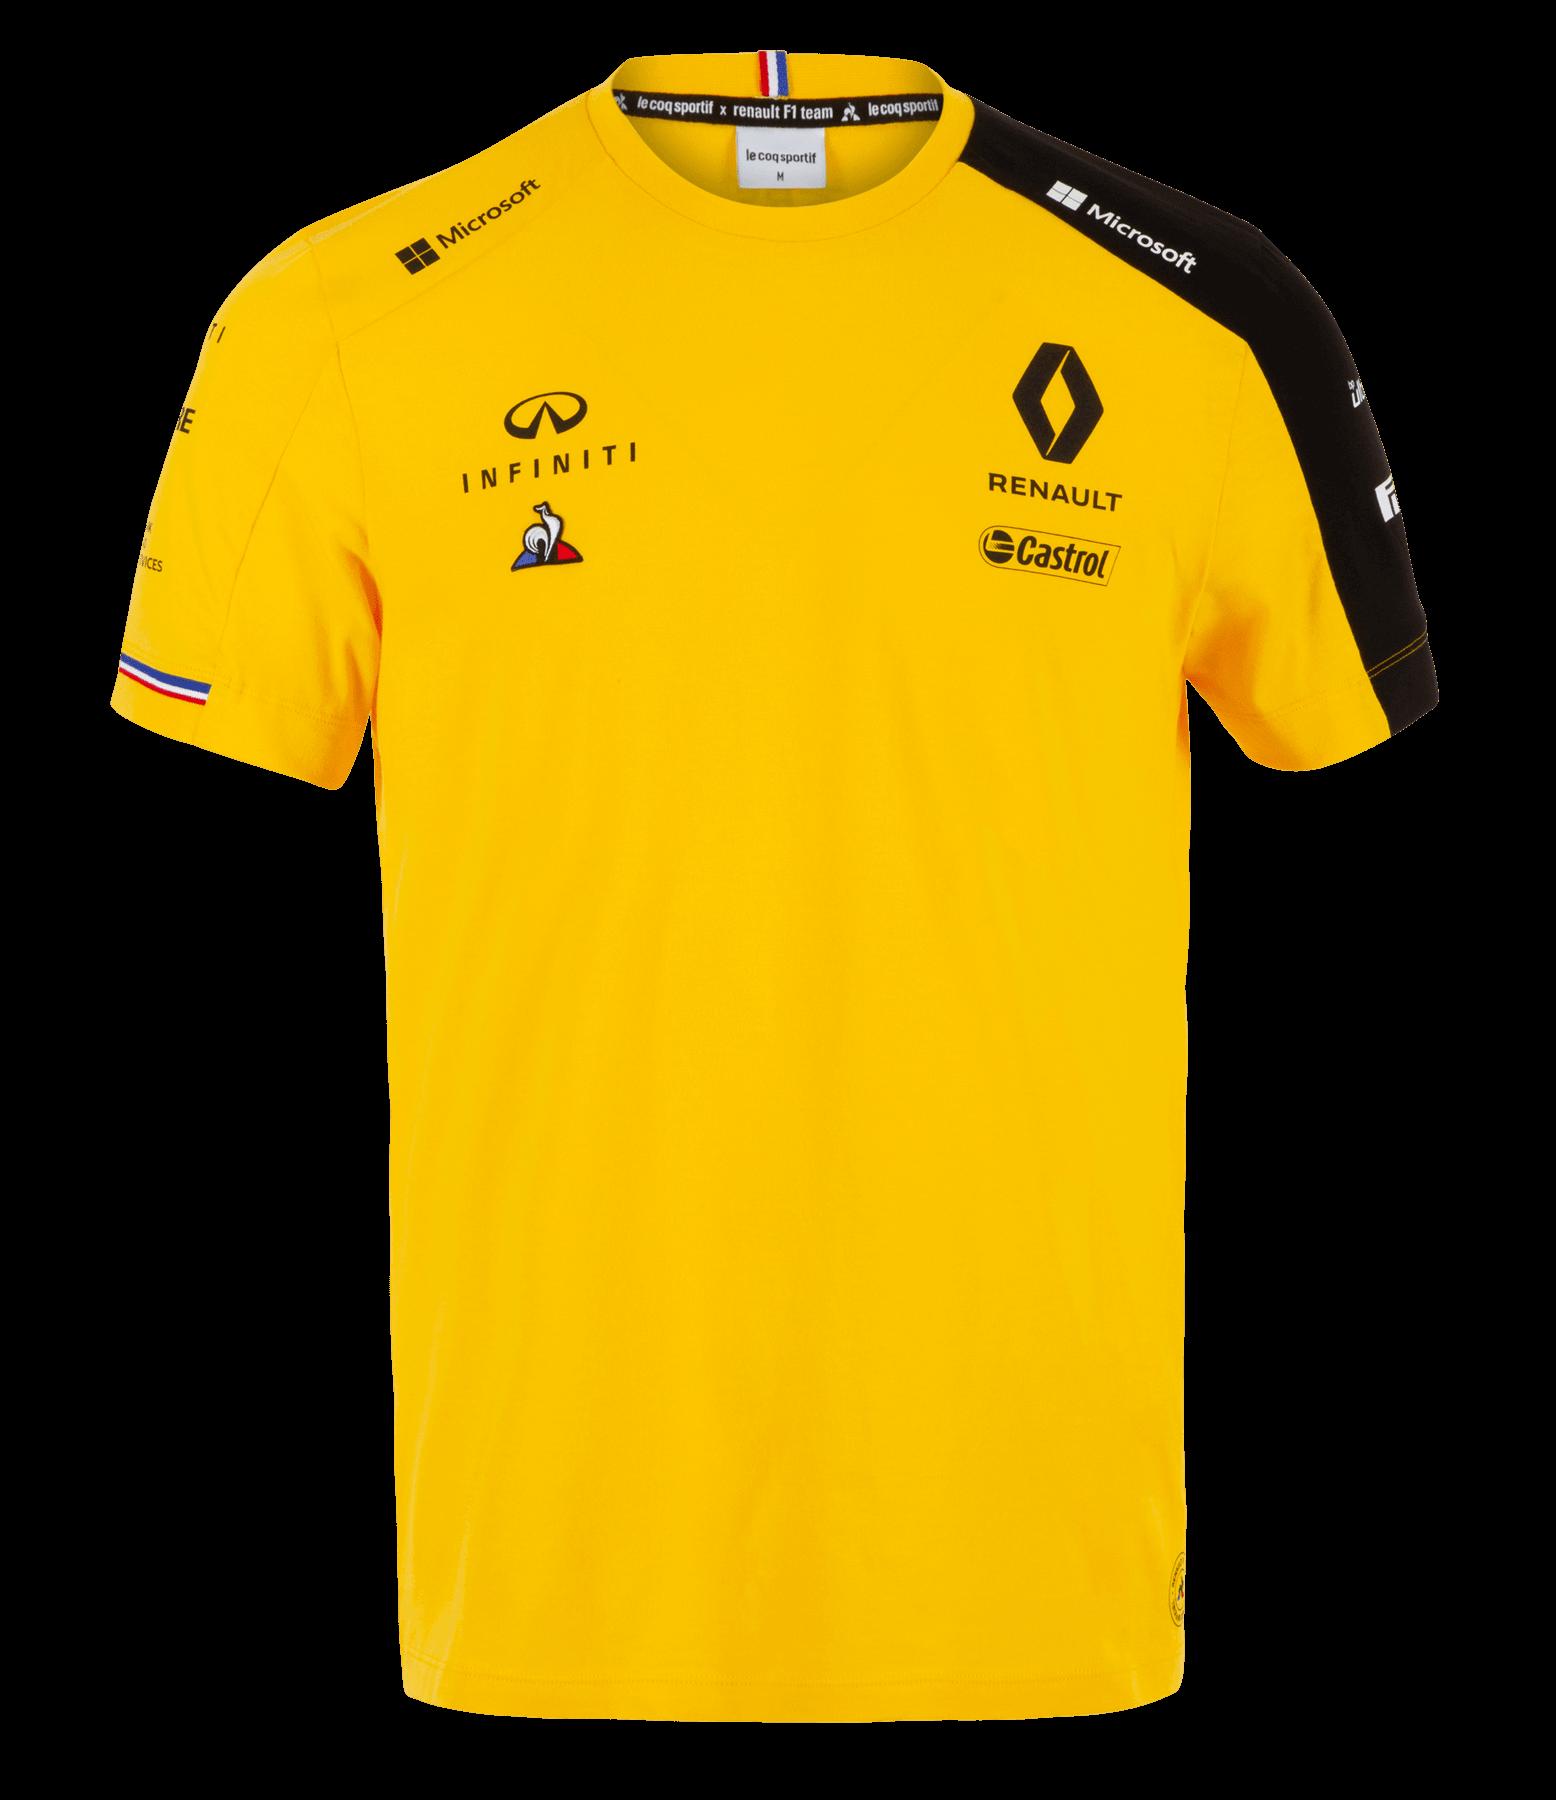 RENAULT F1® TEAM 2019 men's t-shirt - Hülkenberg